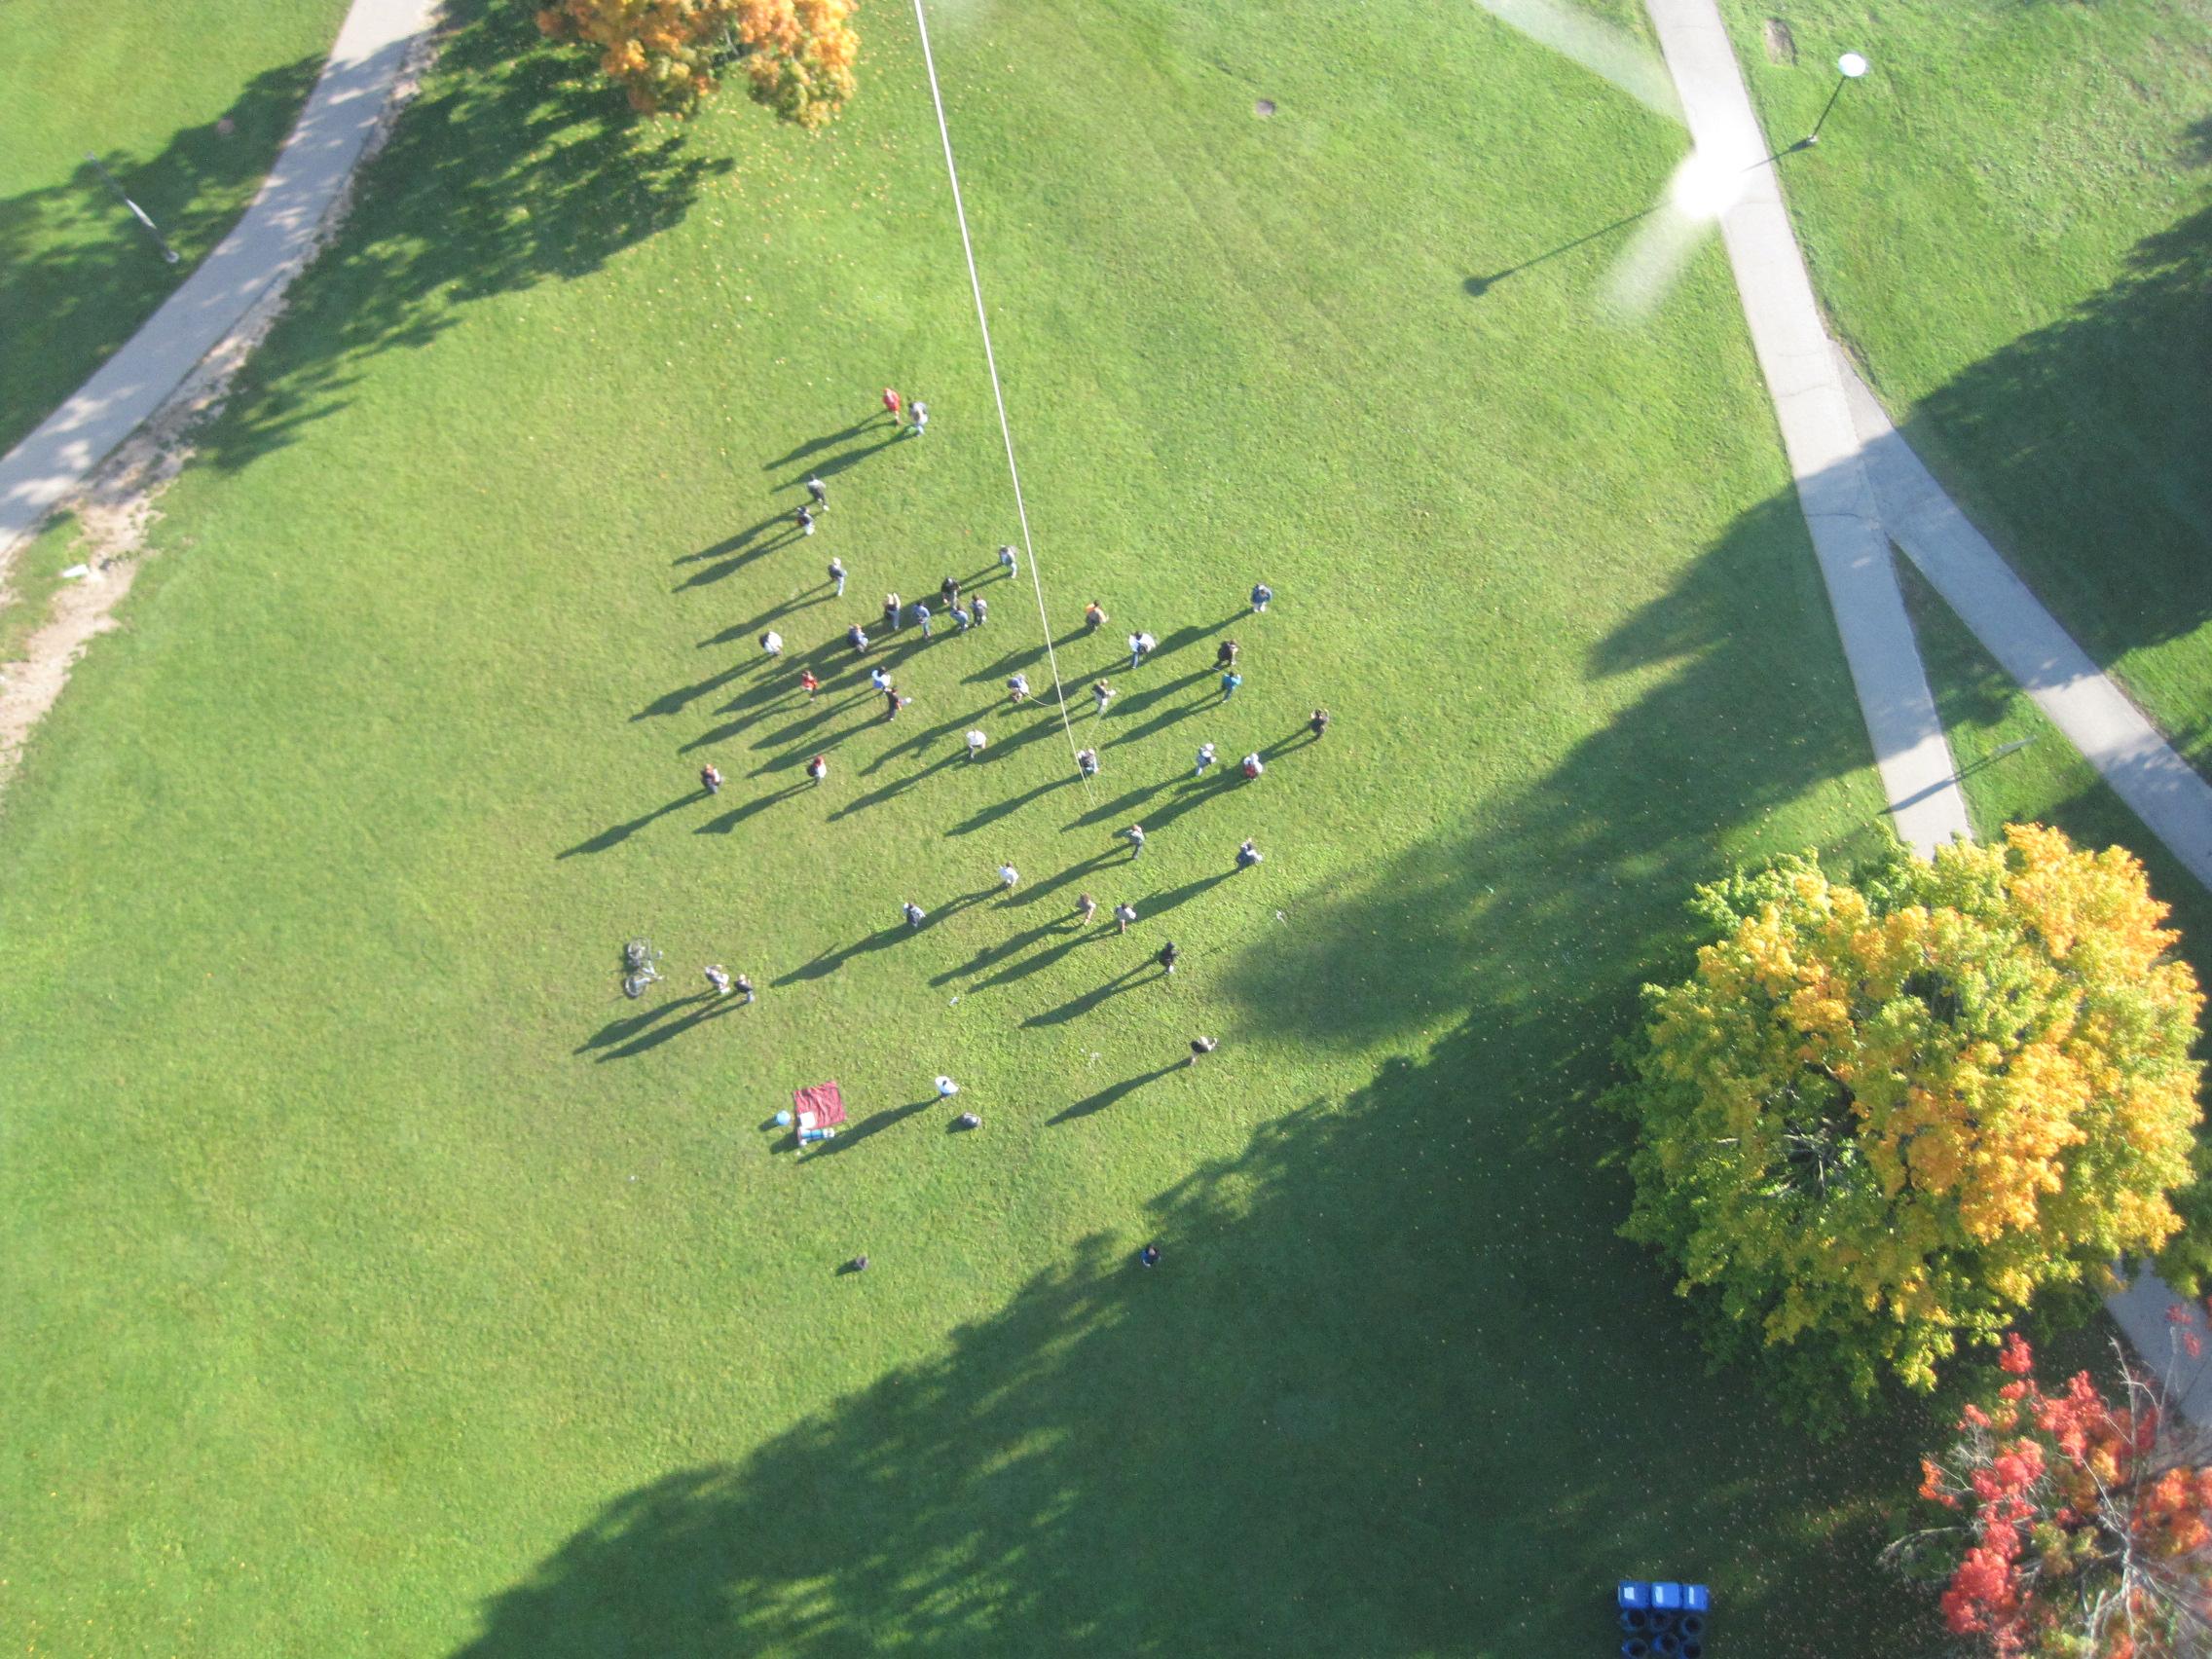 balloon-aerial-photo